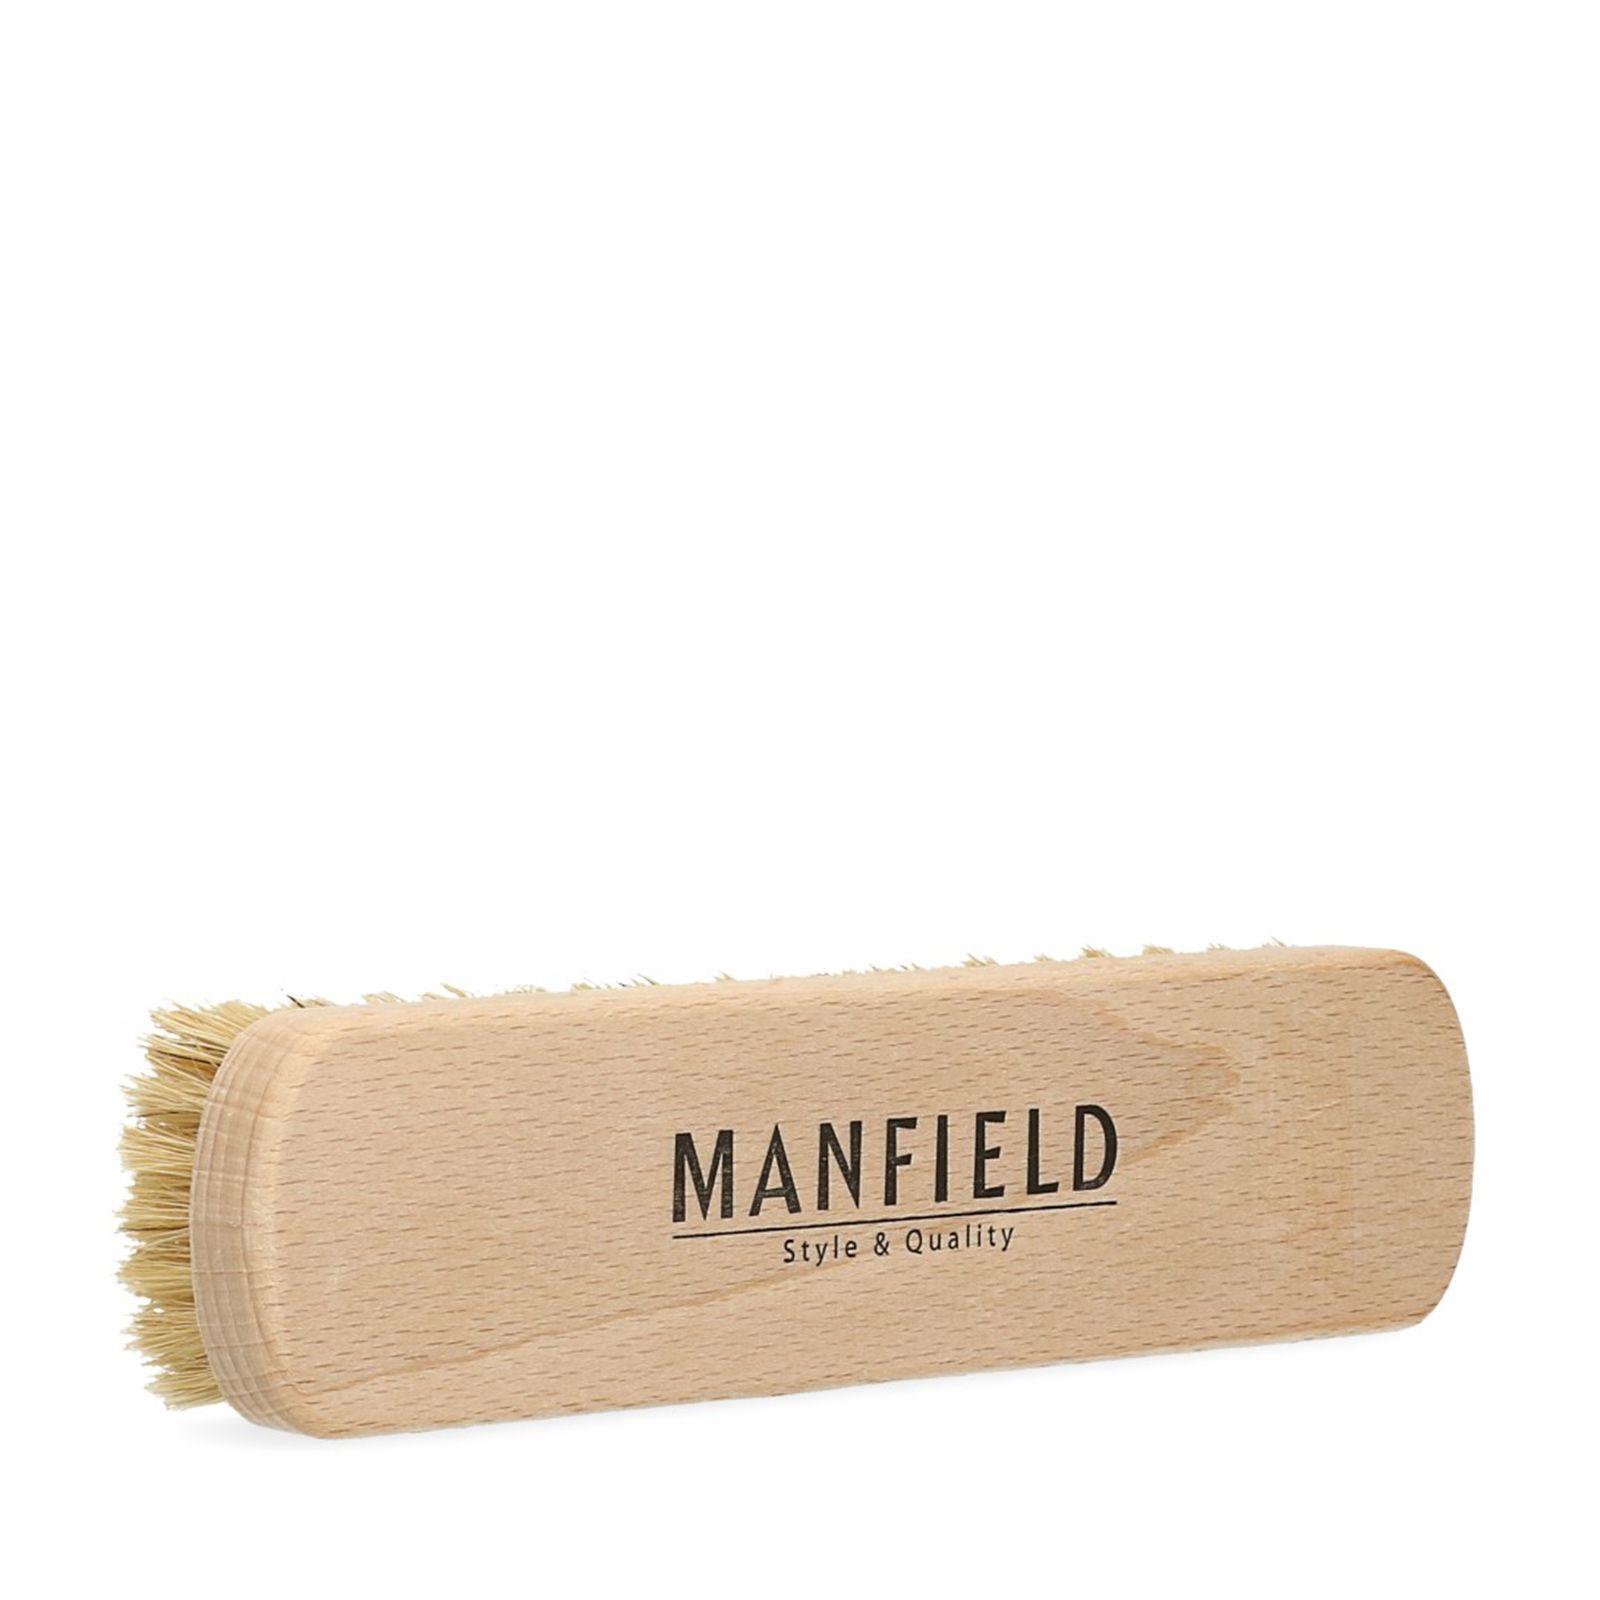 Schoenverzorging online shoppen | MANFIELD